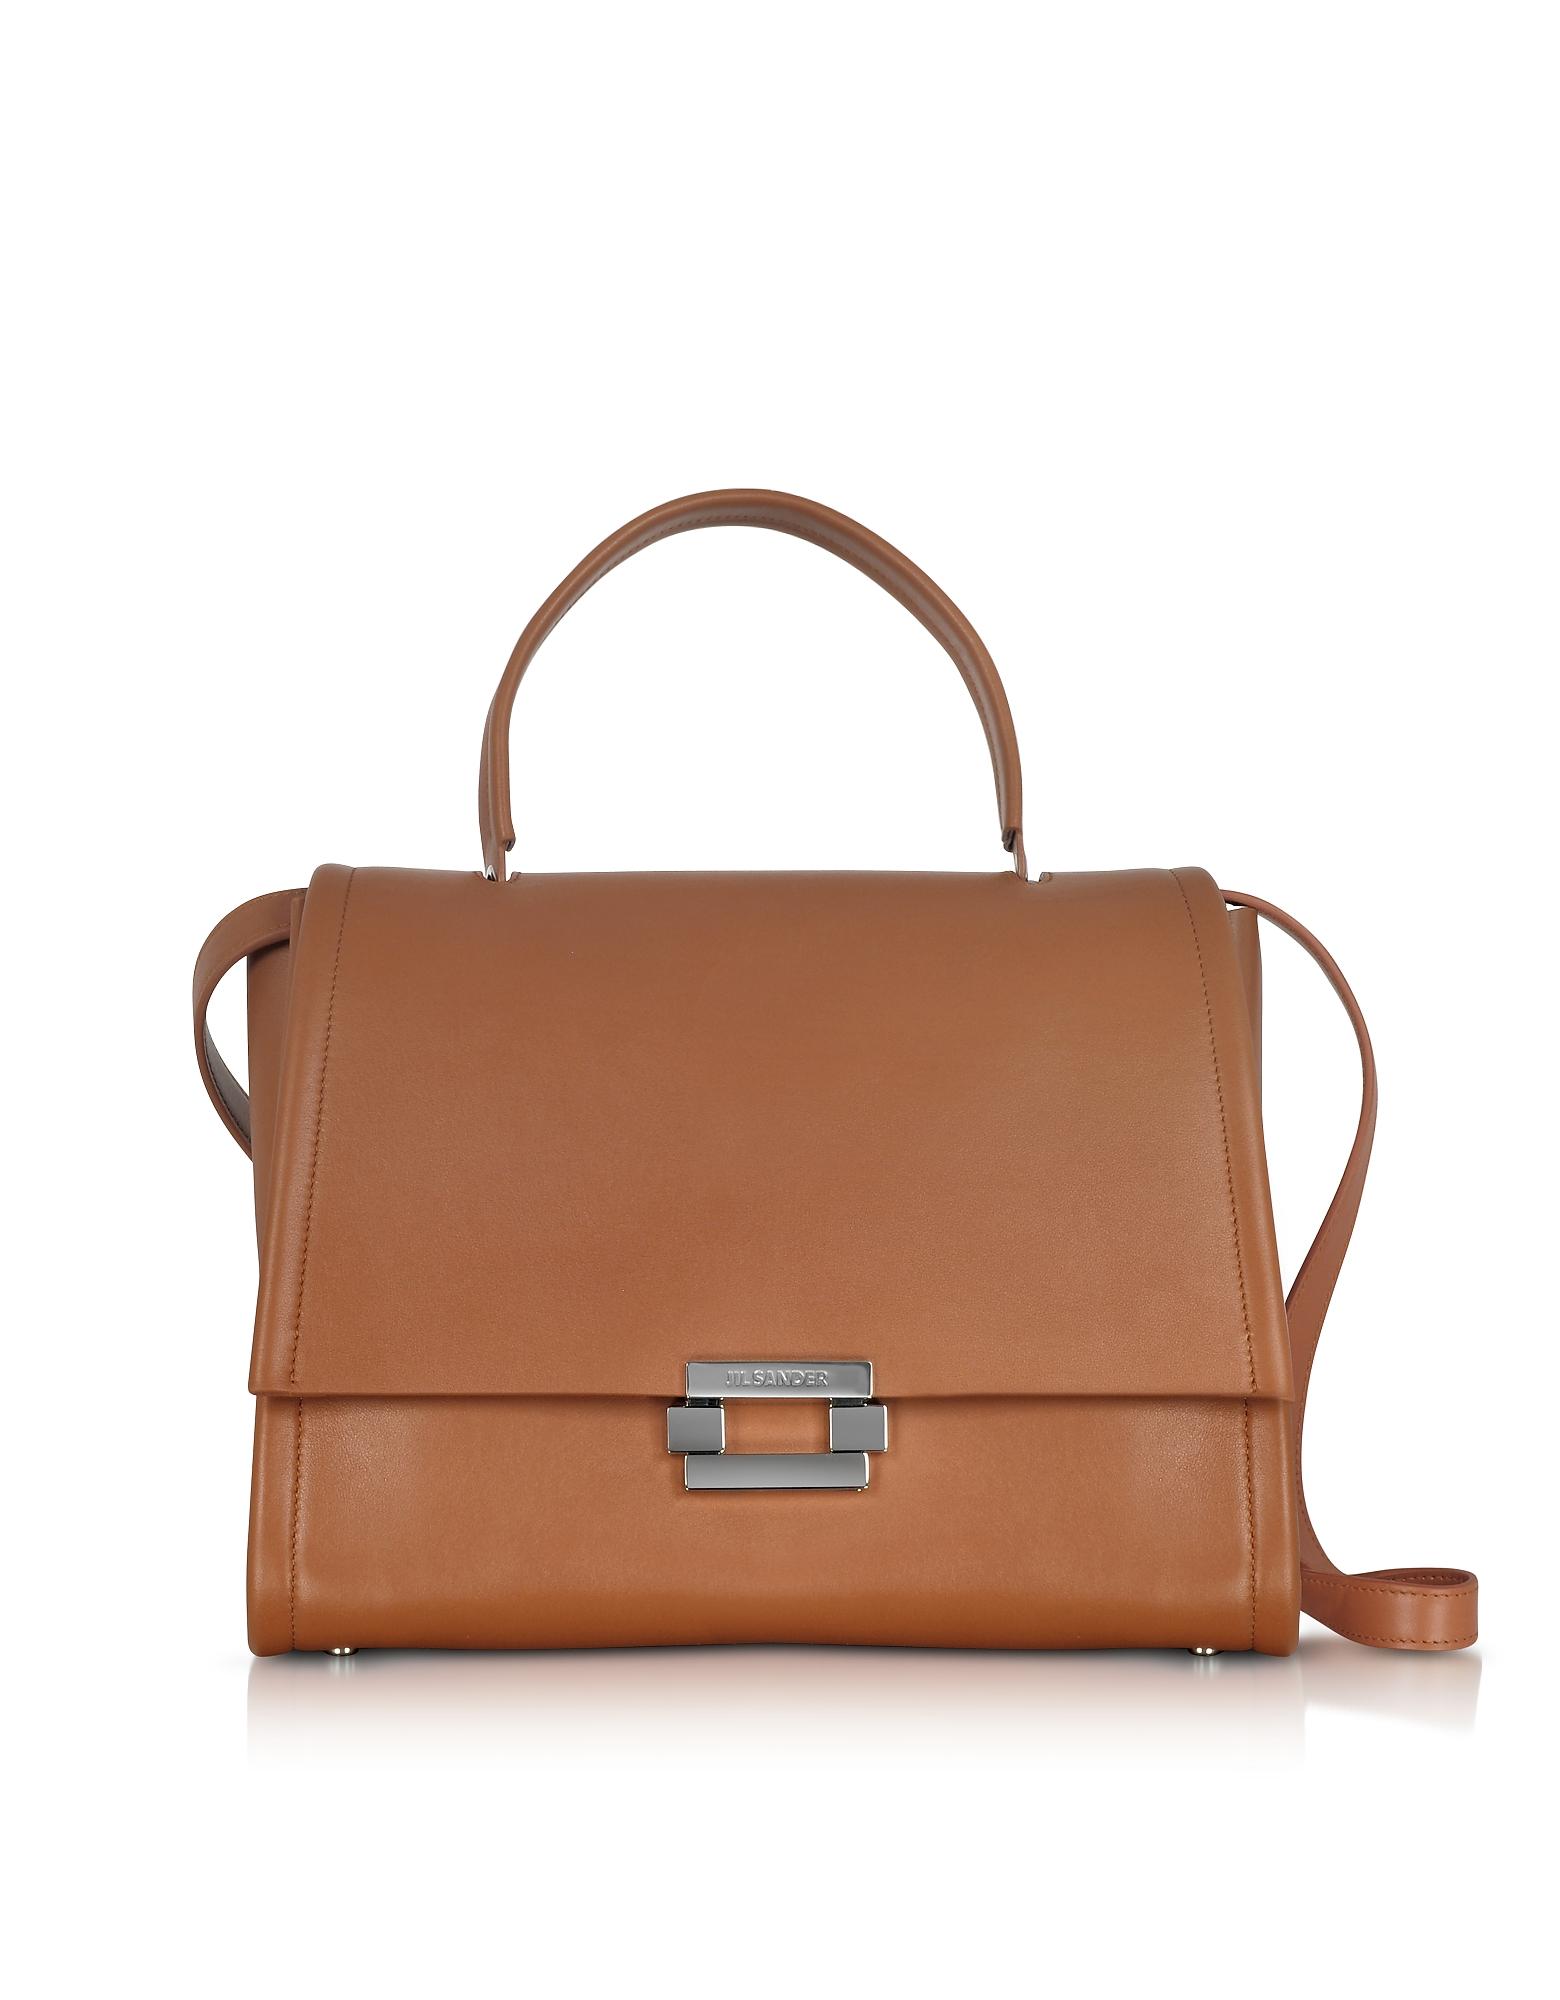 Jil Sander Handbags, Open Brown leather Refold Top Handle Satchel Bag